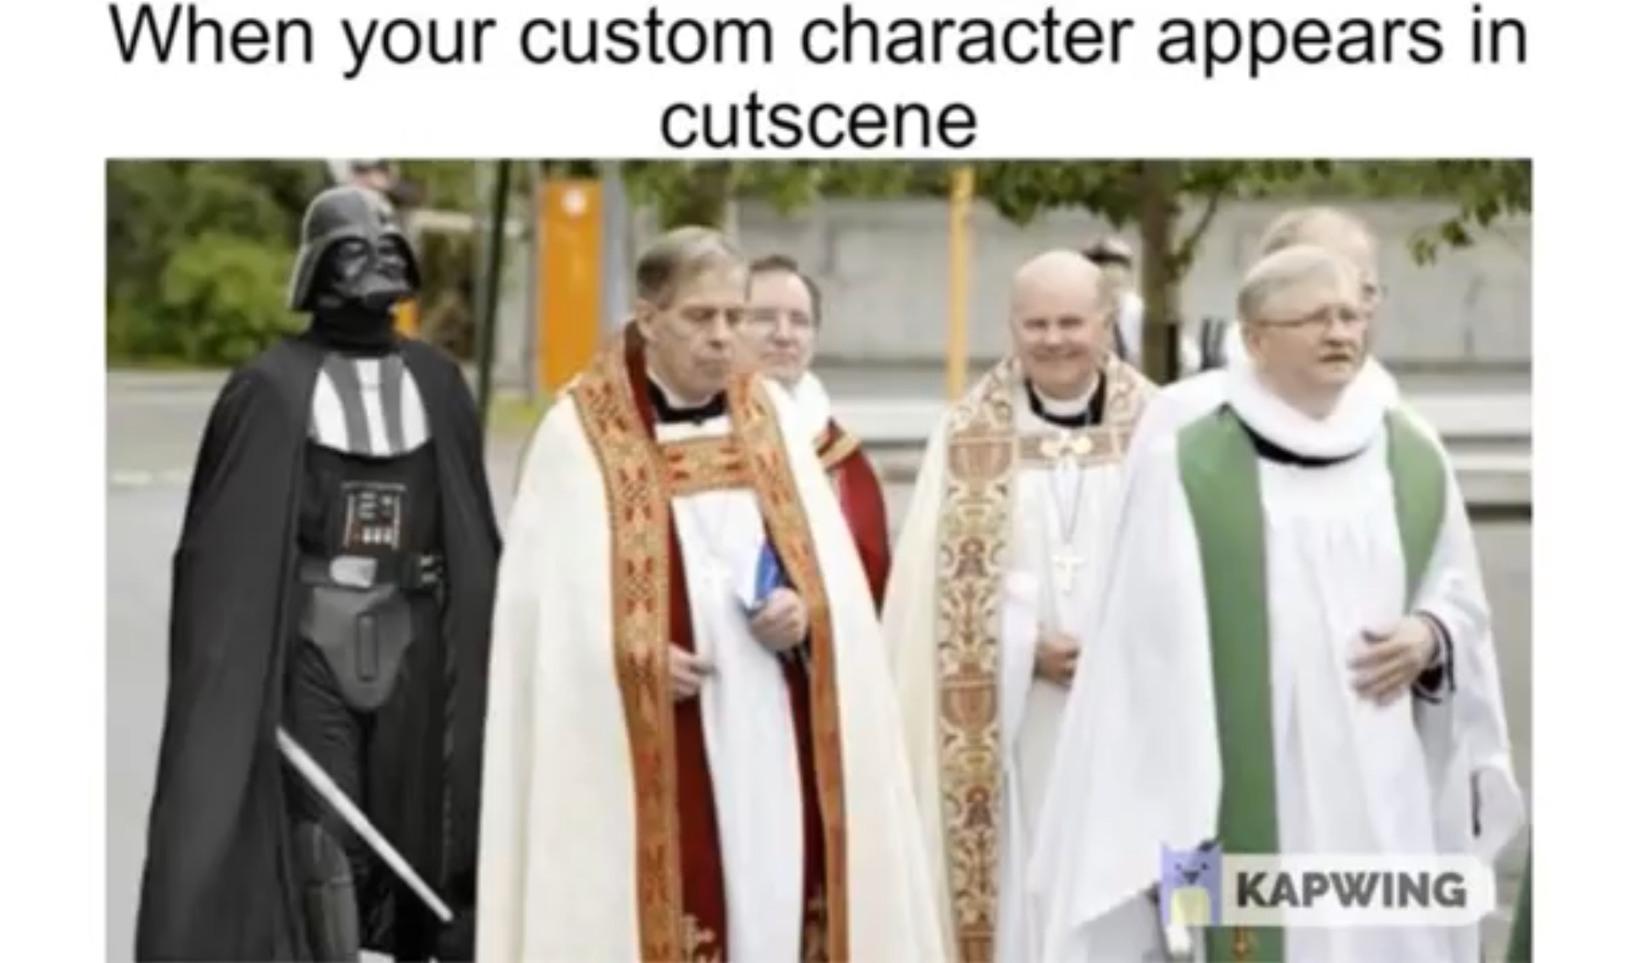 Cutscene - meme